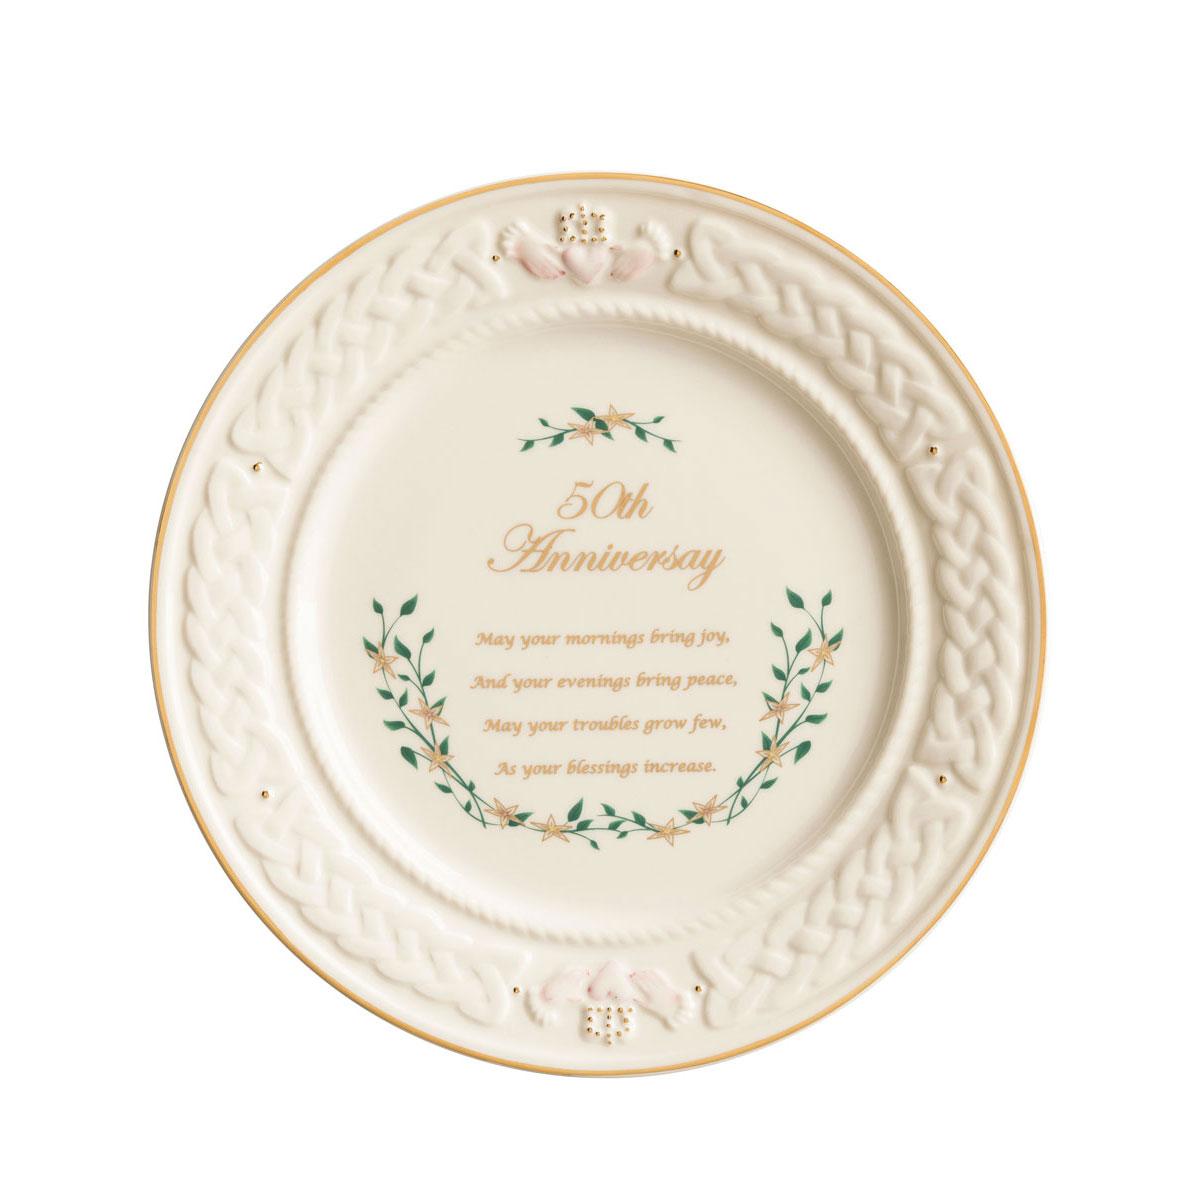 Belleek Celebration 50th Anniversary Plate